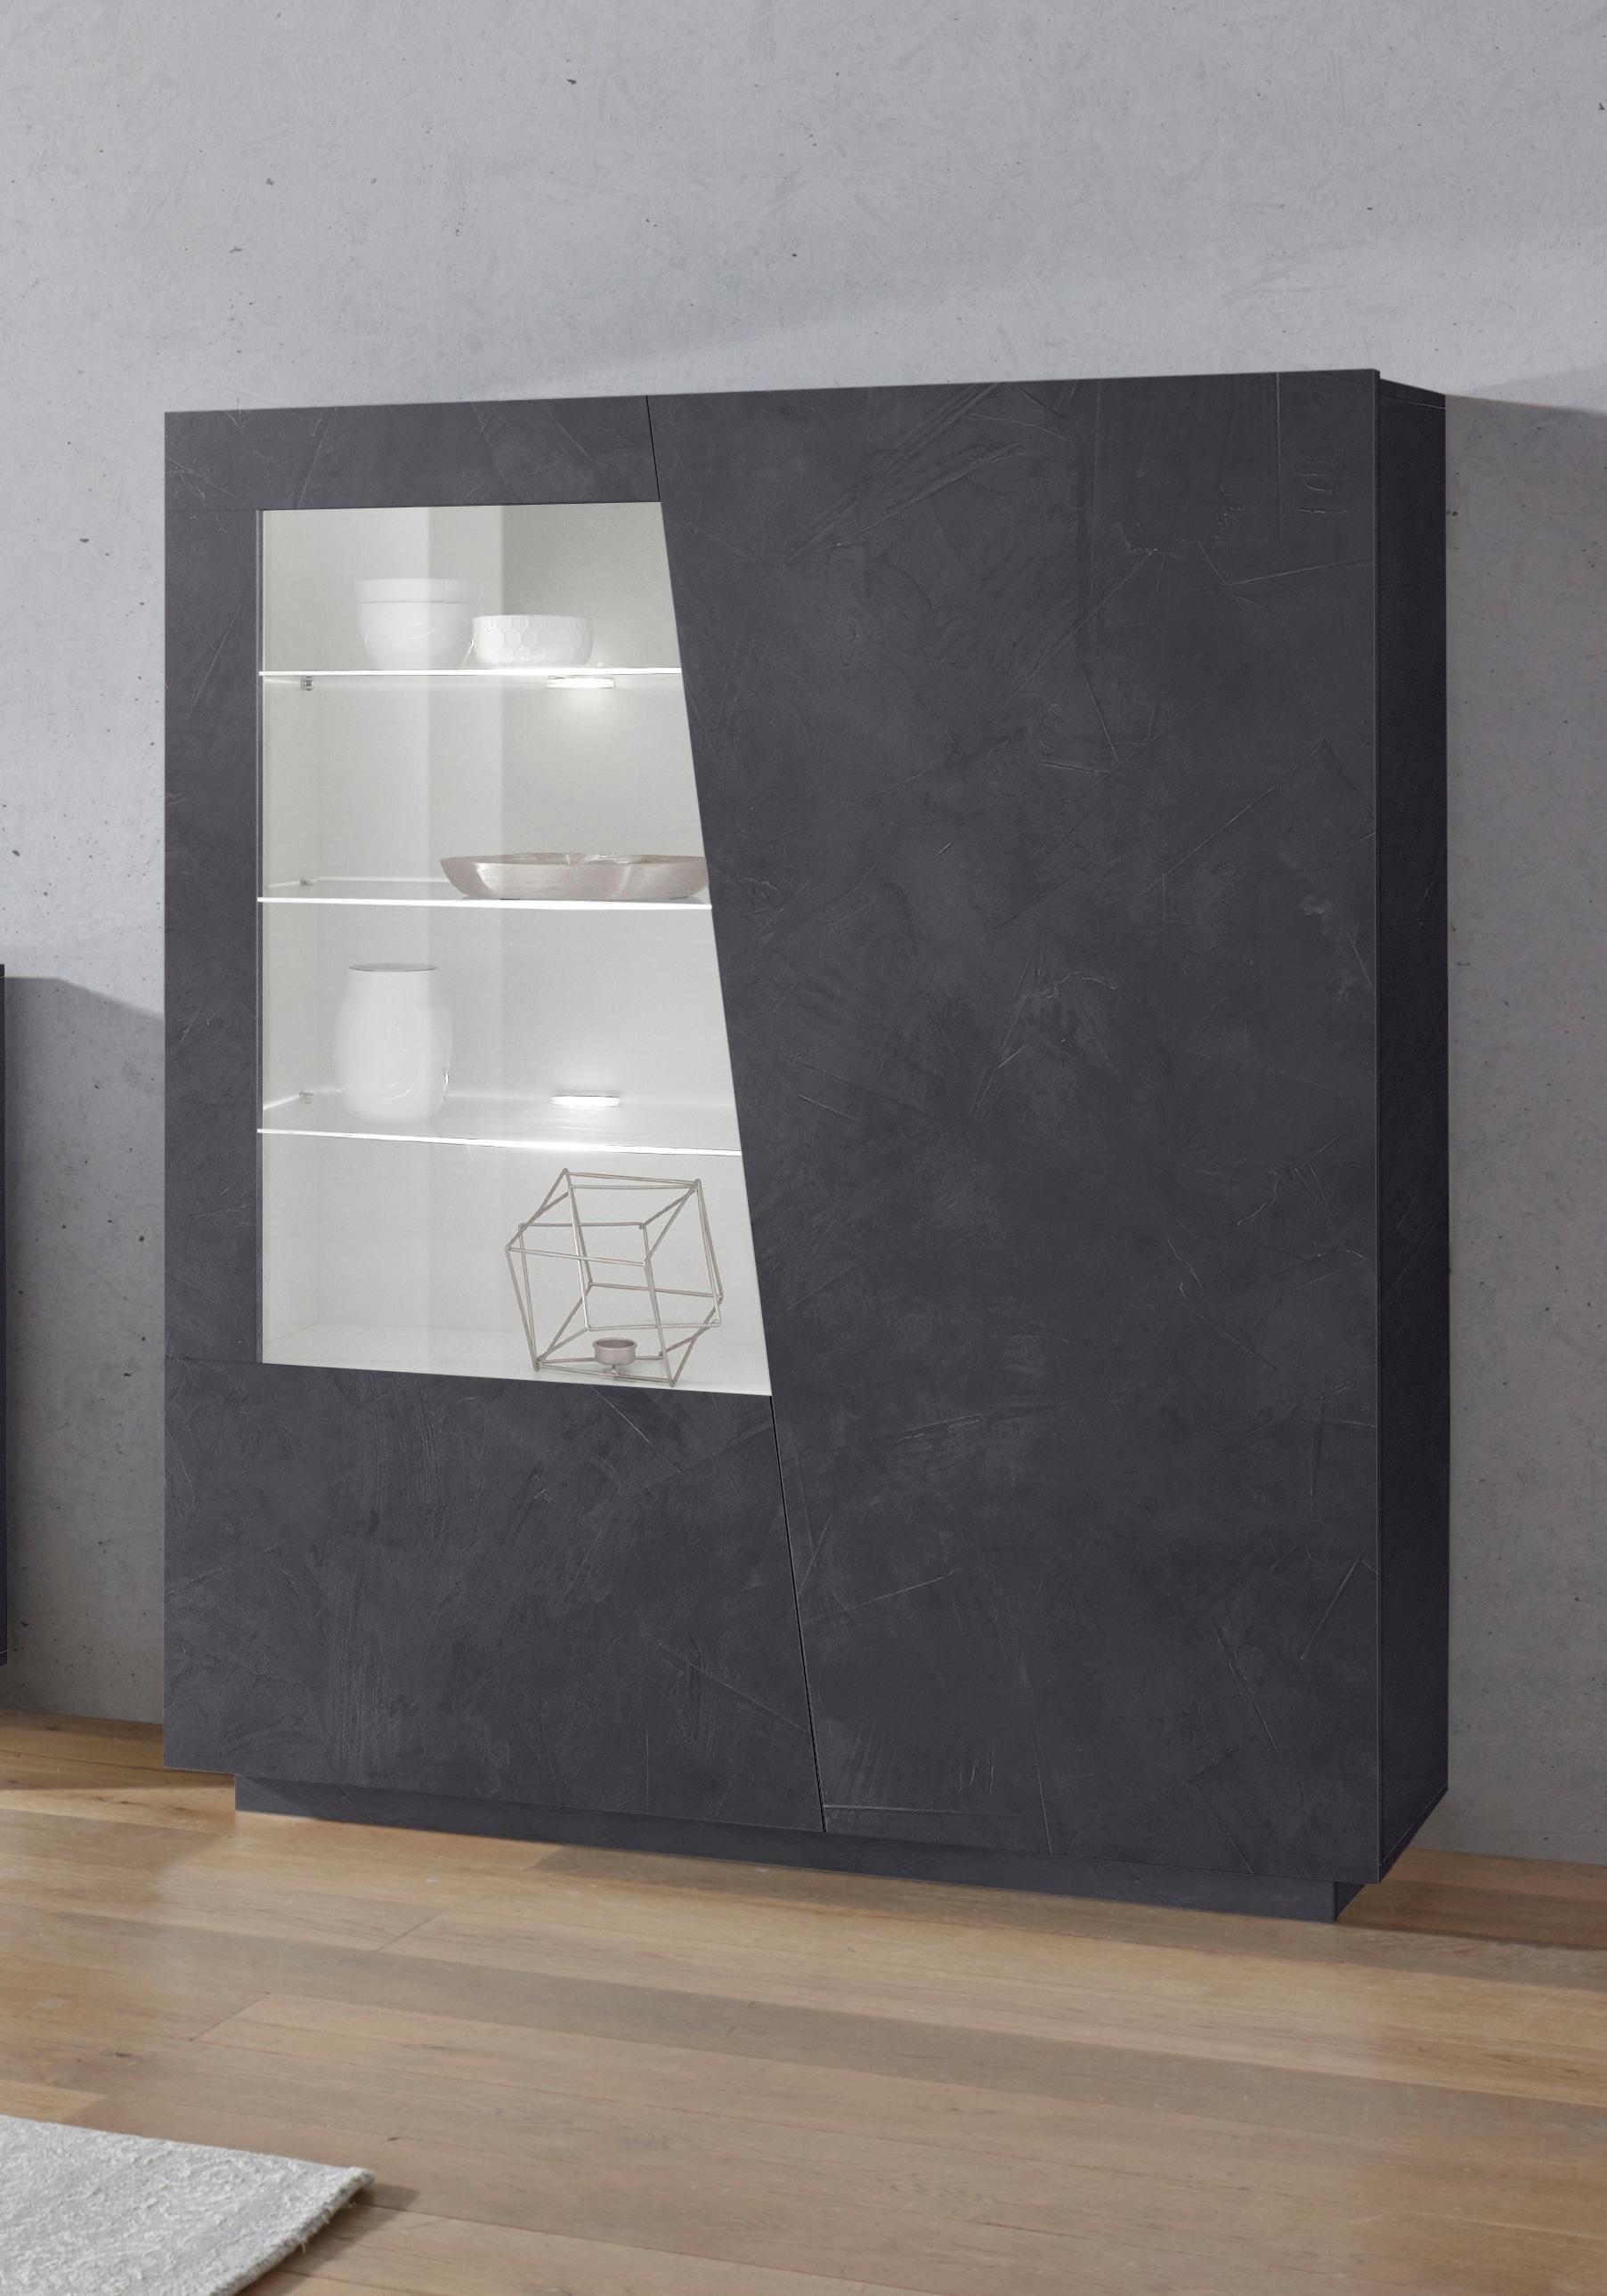 Tecnos highboard »Vega«, hoogte 146 cm voordelig en veilig online kopen